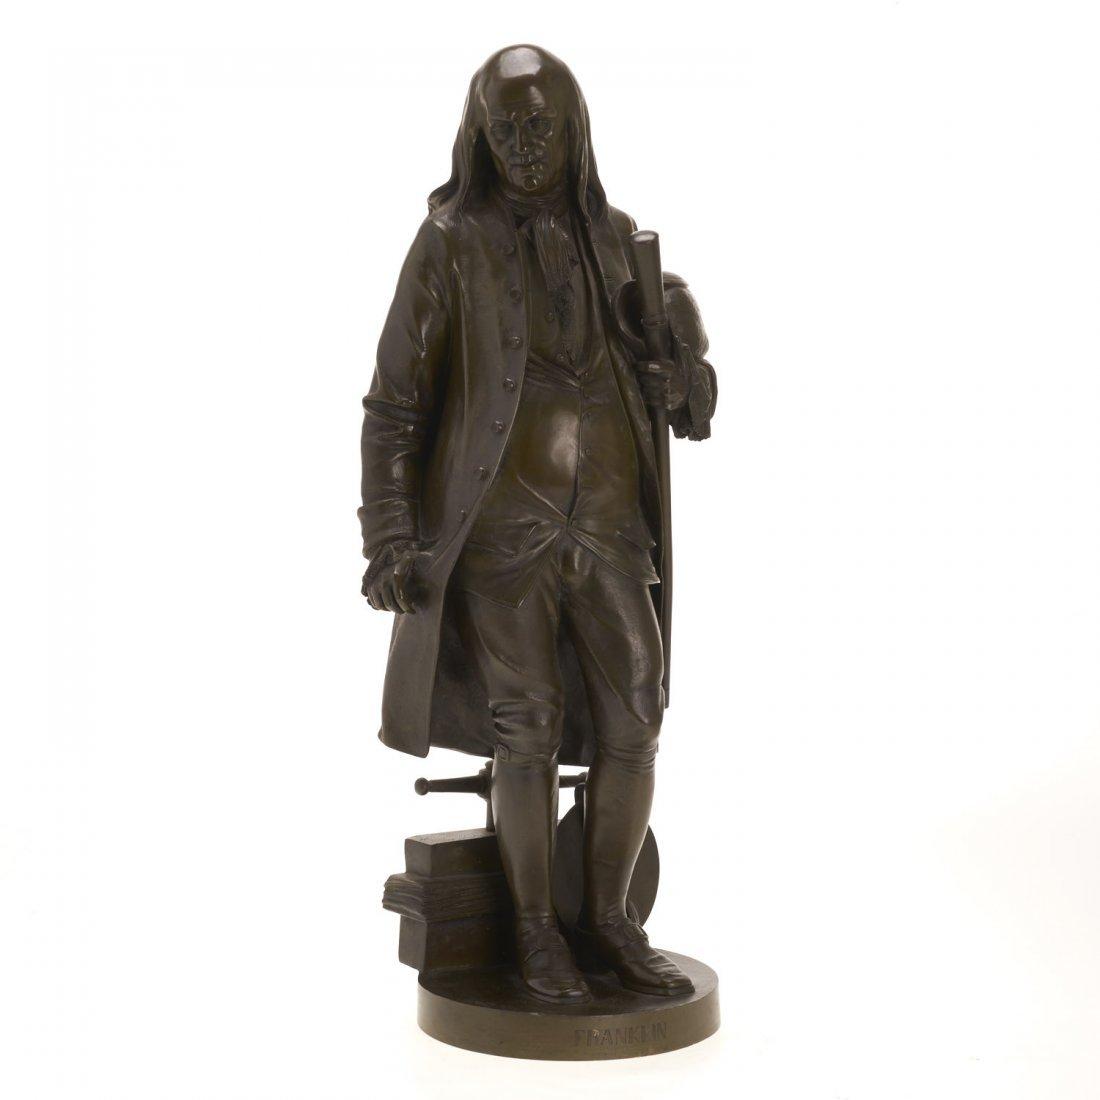 After Jean Jules Salmson, bronze statuette